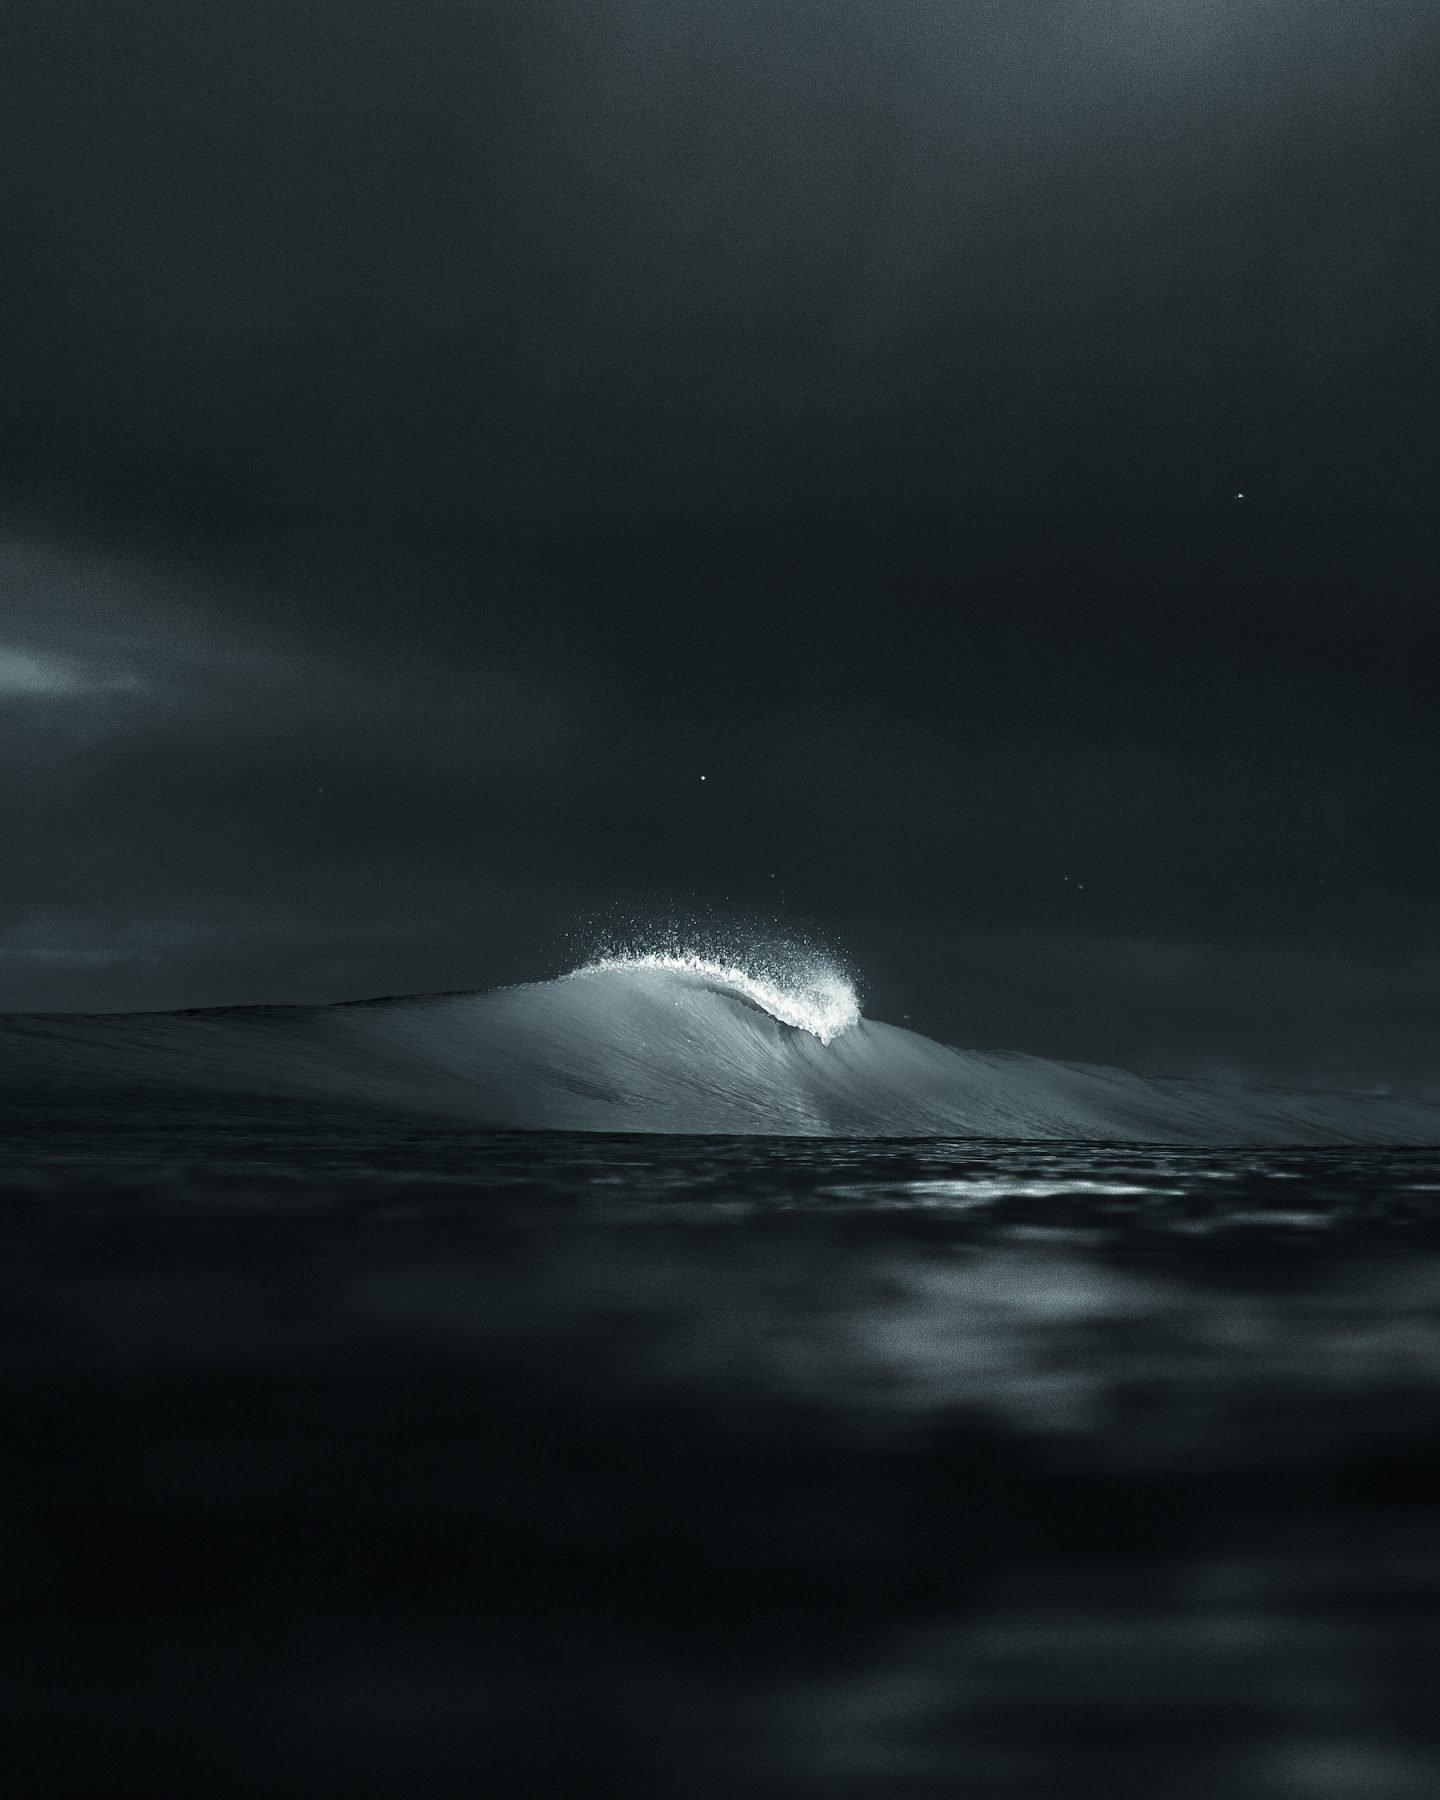 IGNANT-Photography-Micha-Pelka-03